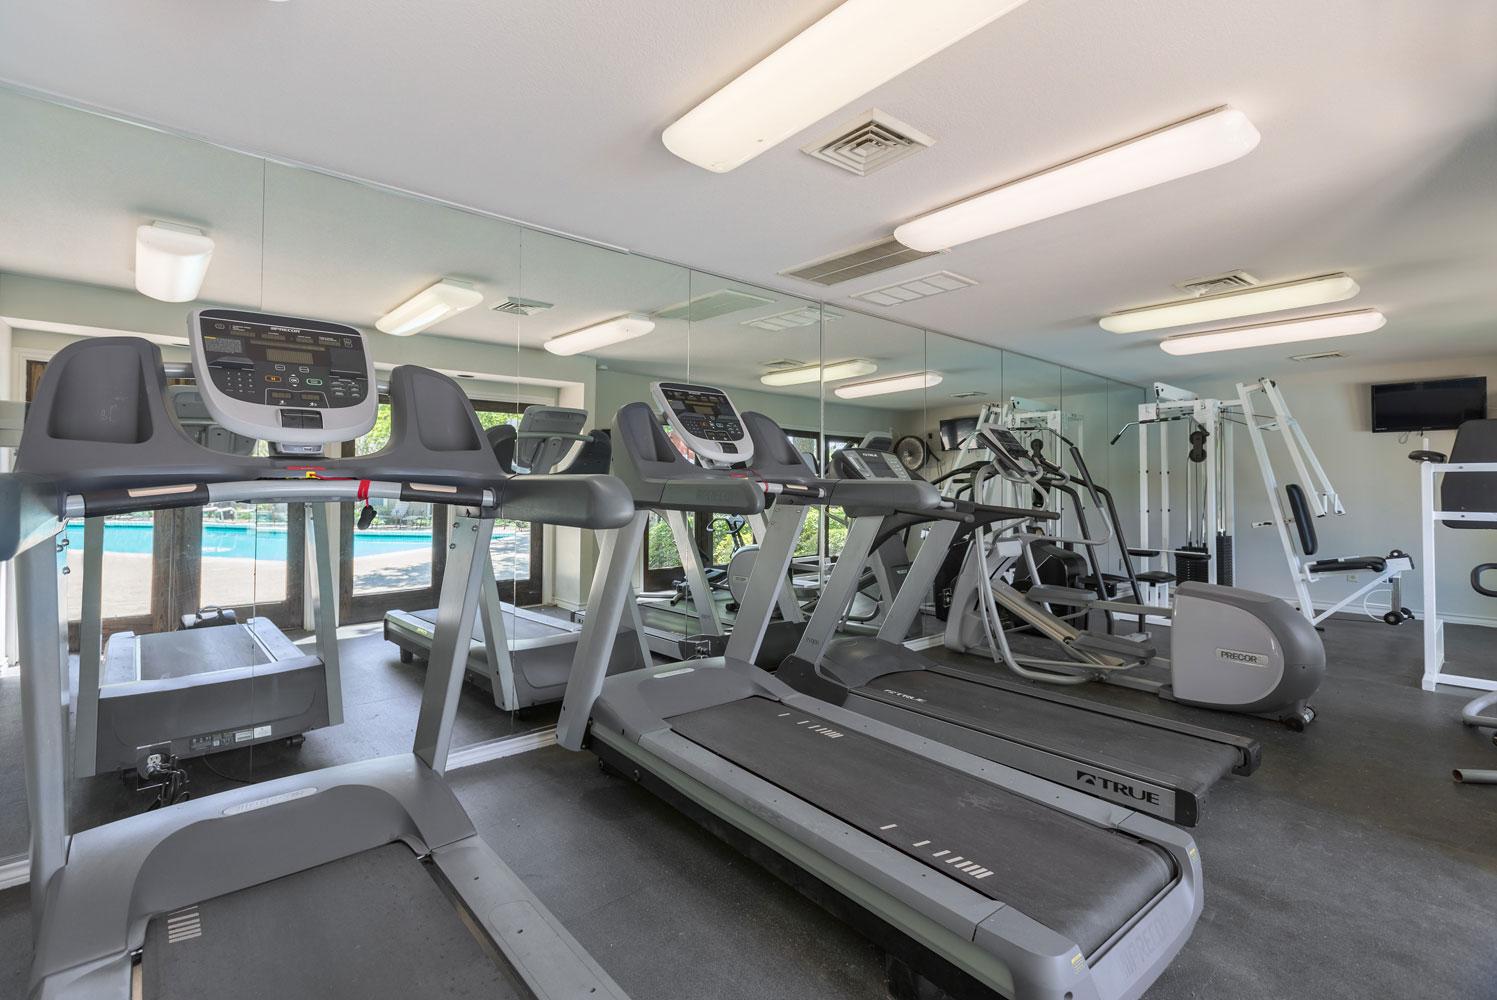 Cardio Machines at Sapphire Apartments in San Antonio, Texas